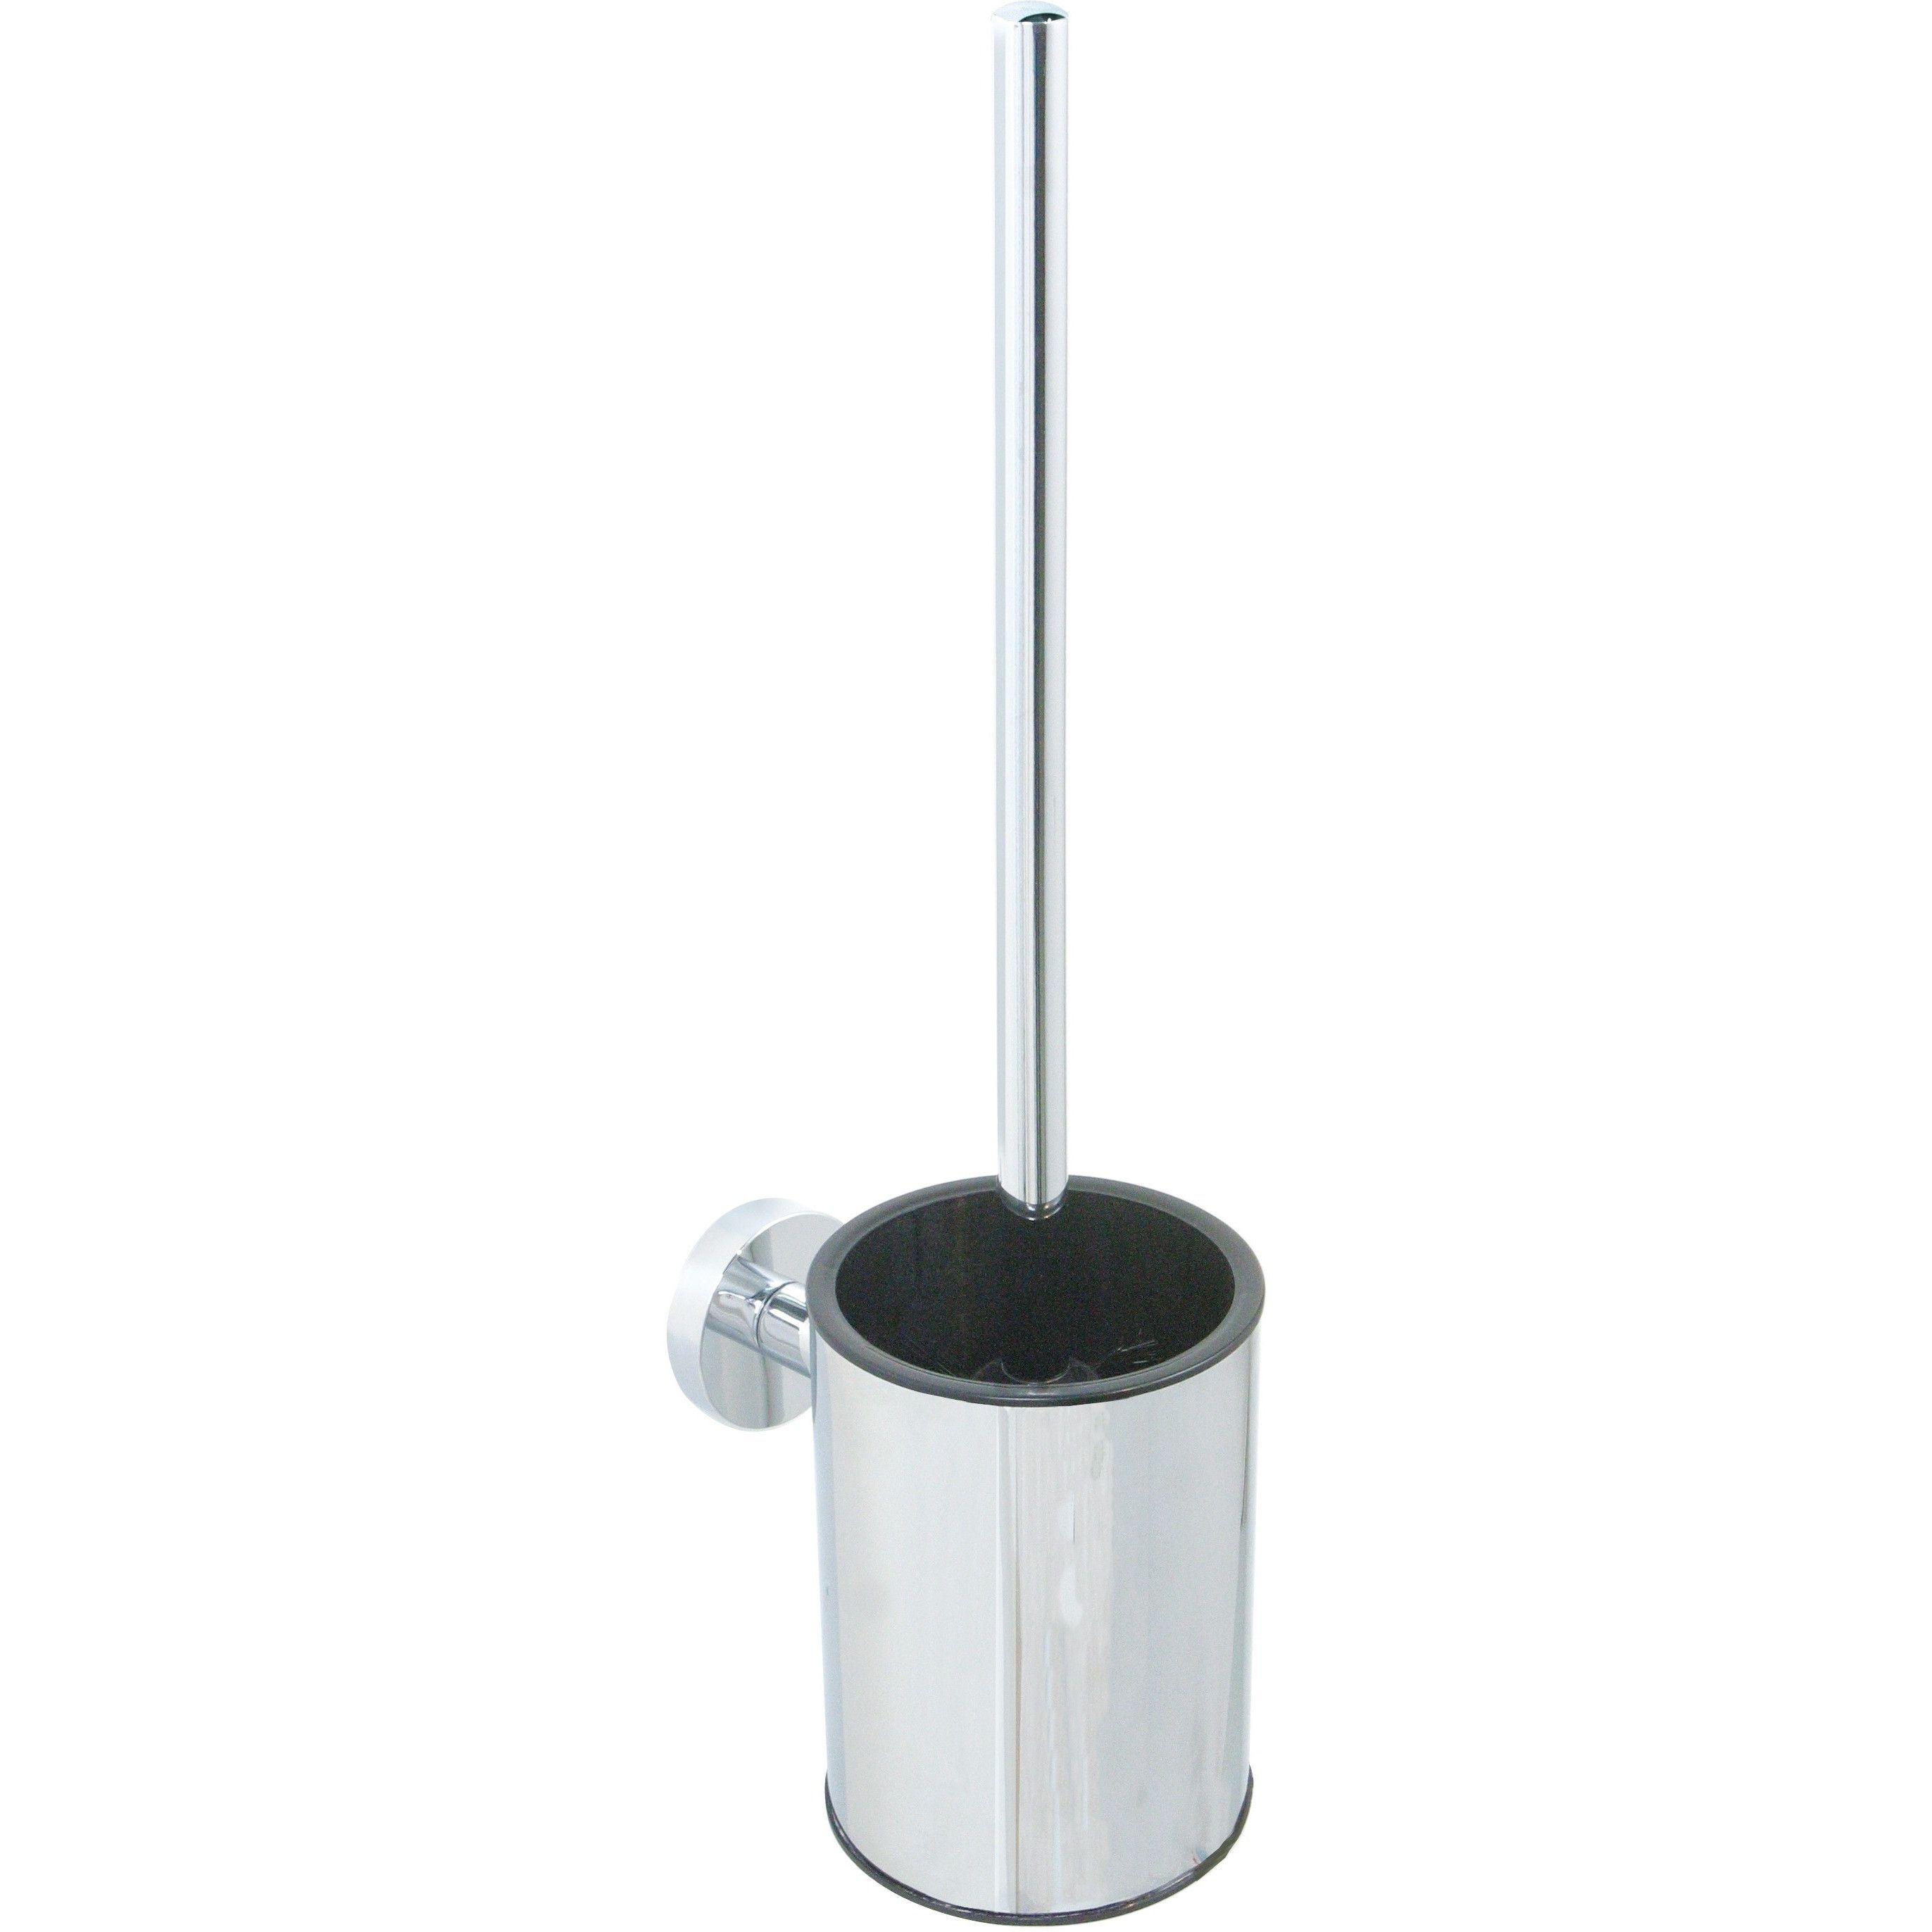 Br Varuna Wall Mounted Round Chrome Toilet Brush Bowl Holder Set